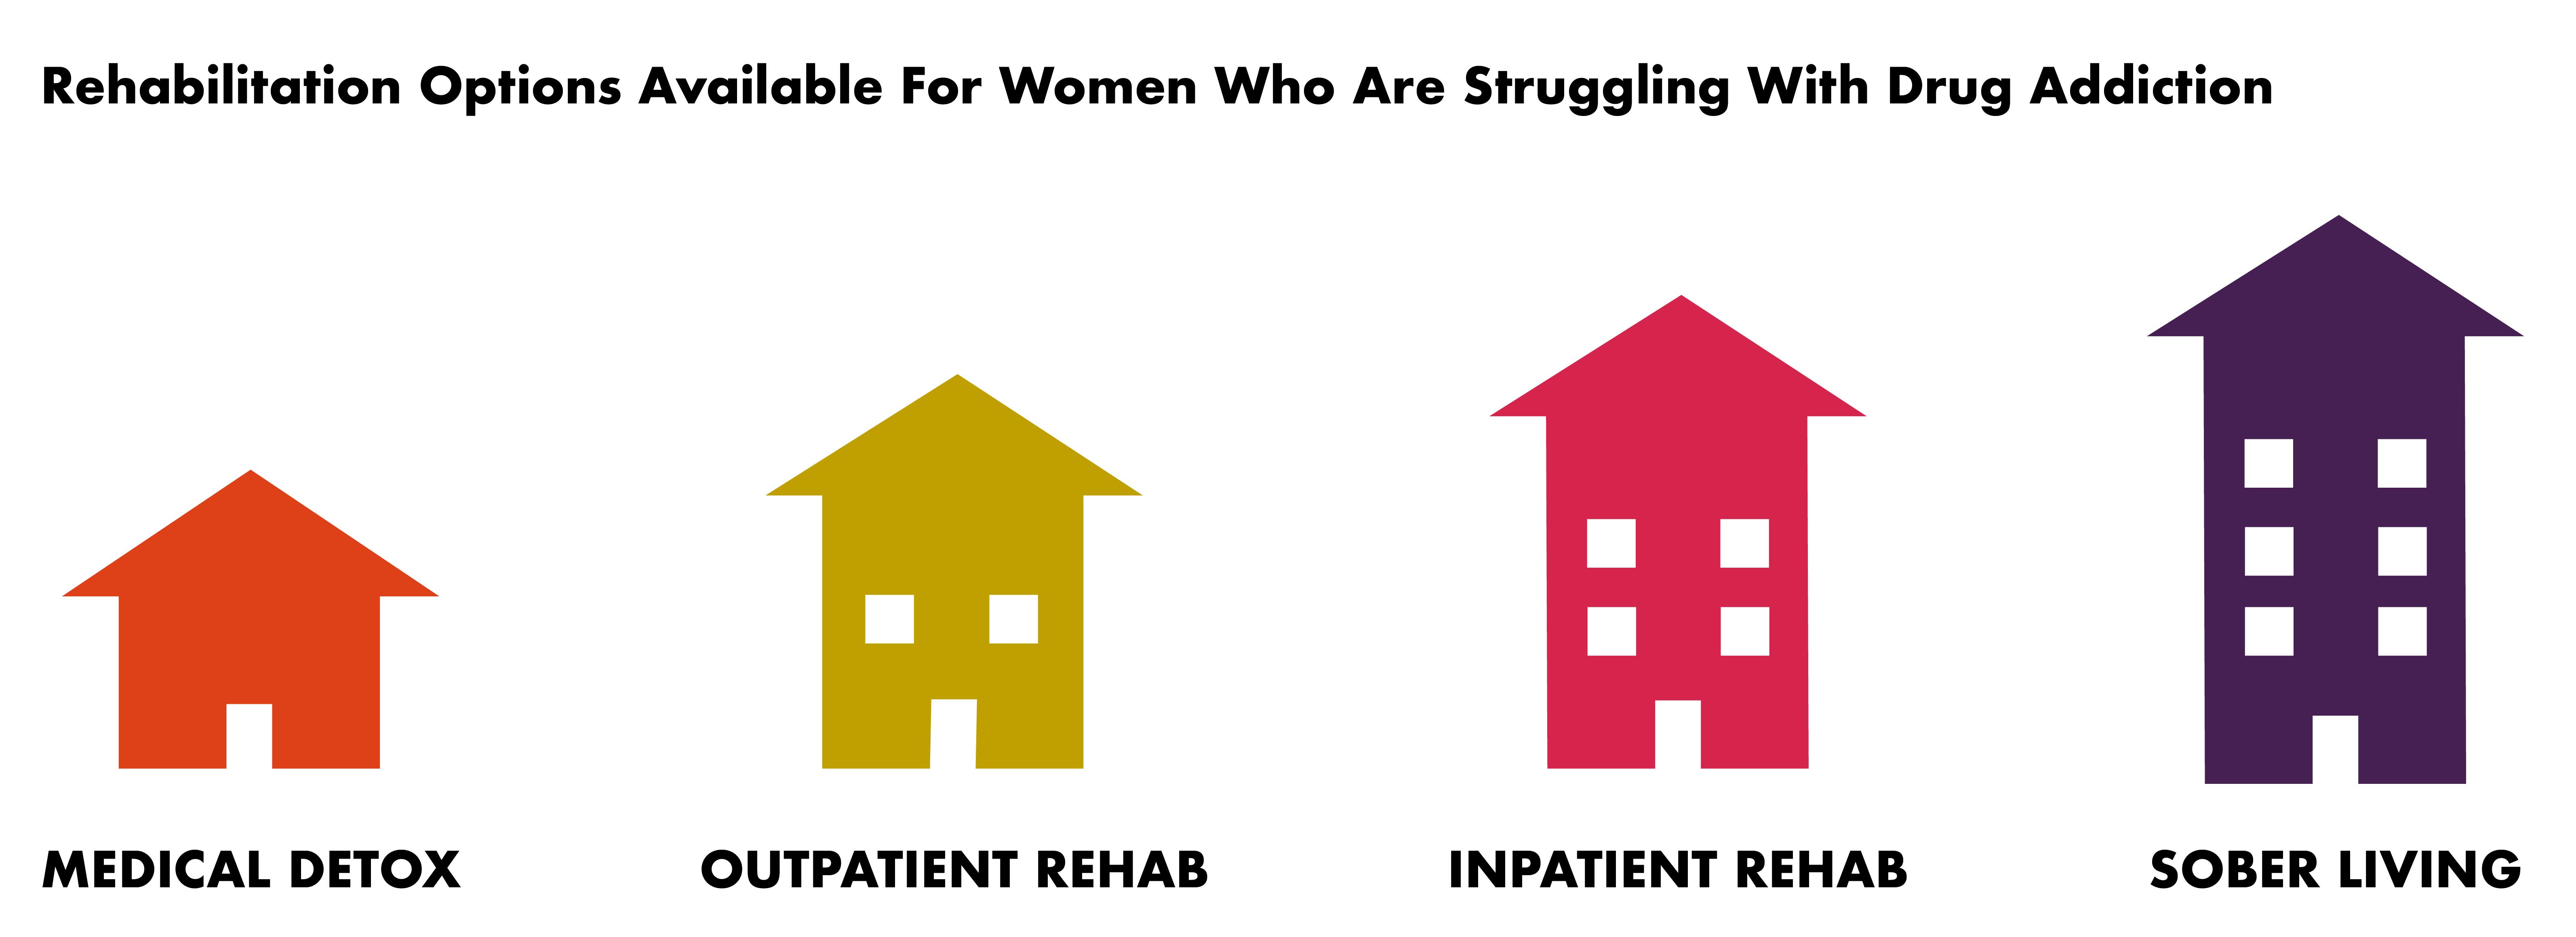 Rehabilitation Guide for Women - Rehabilitation Options